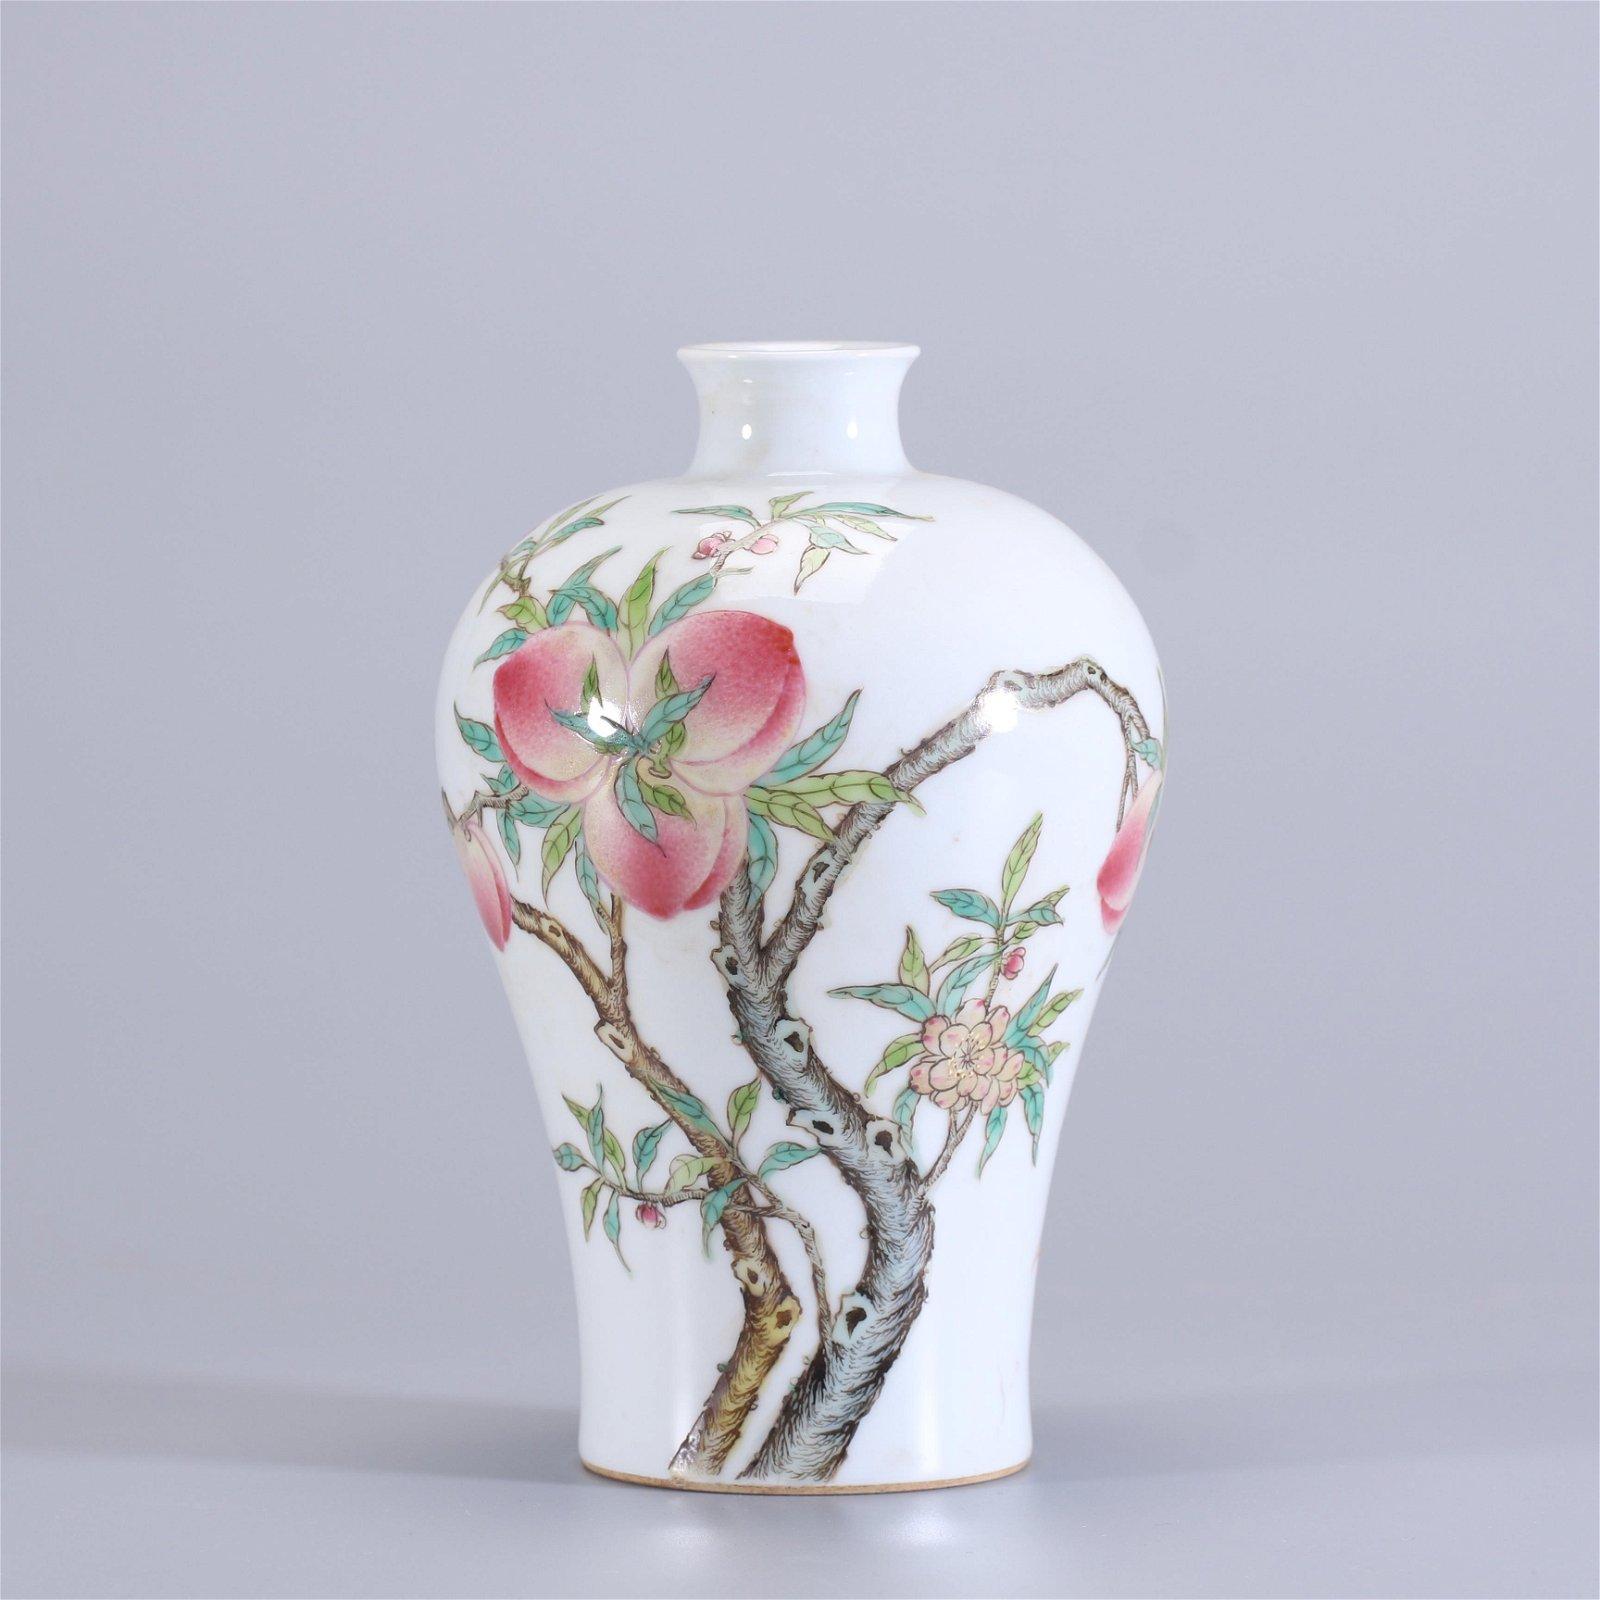 China, 19C., a porcelain vase.